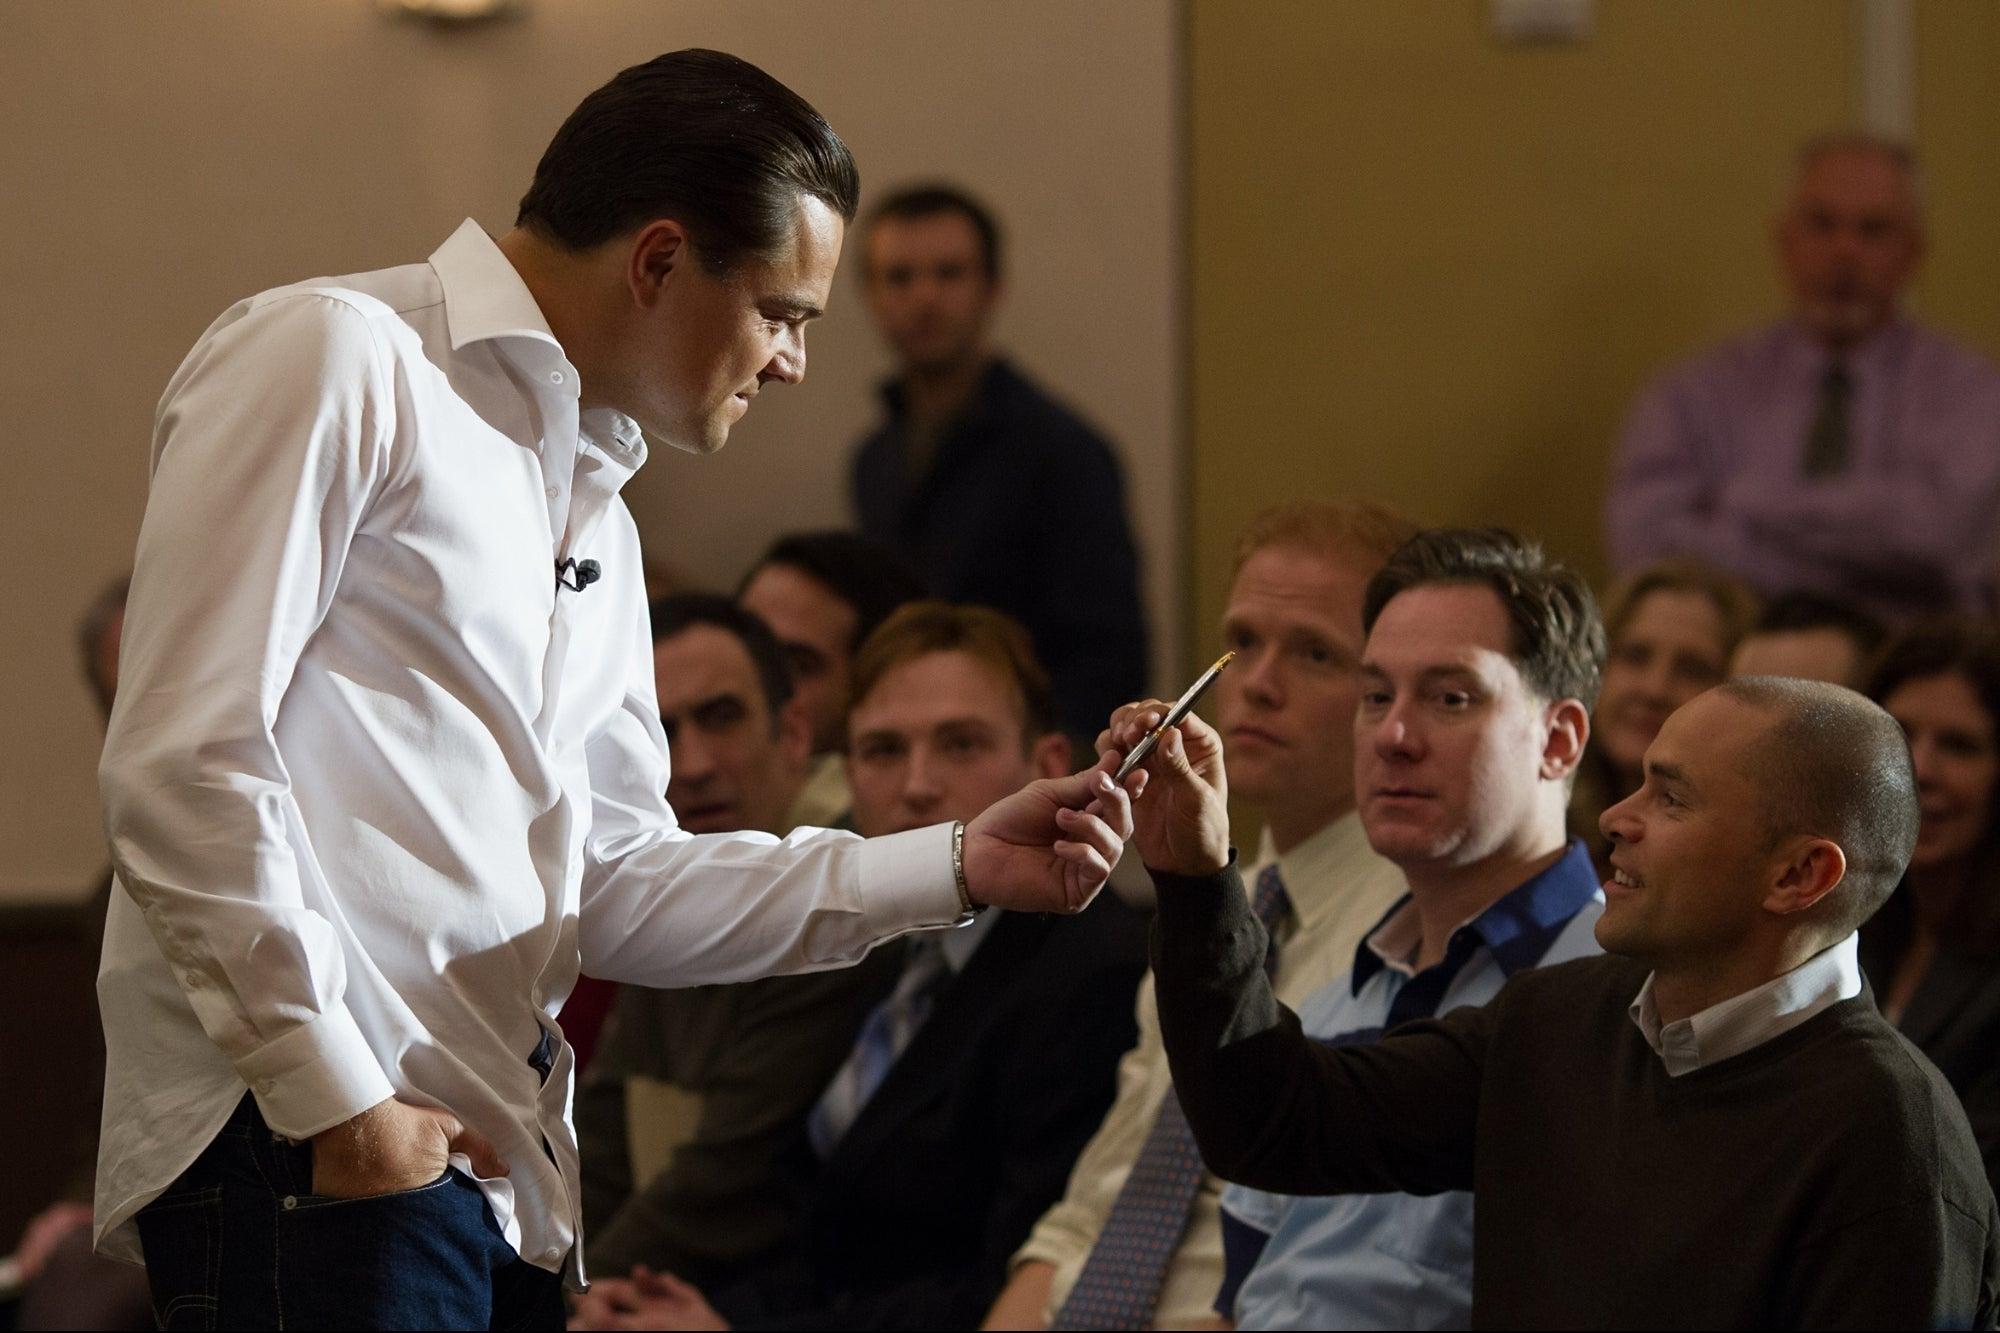 Does Jordan Belfort's 'Sell Me This Pen' Sales Trick Actually Work?